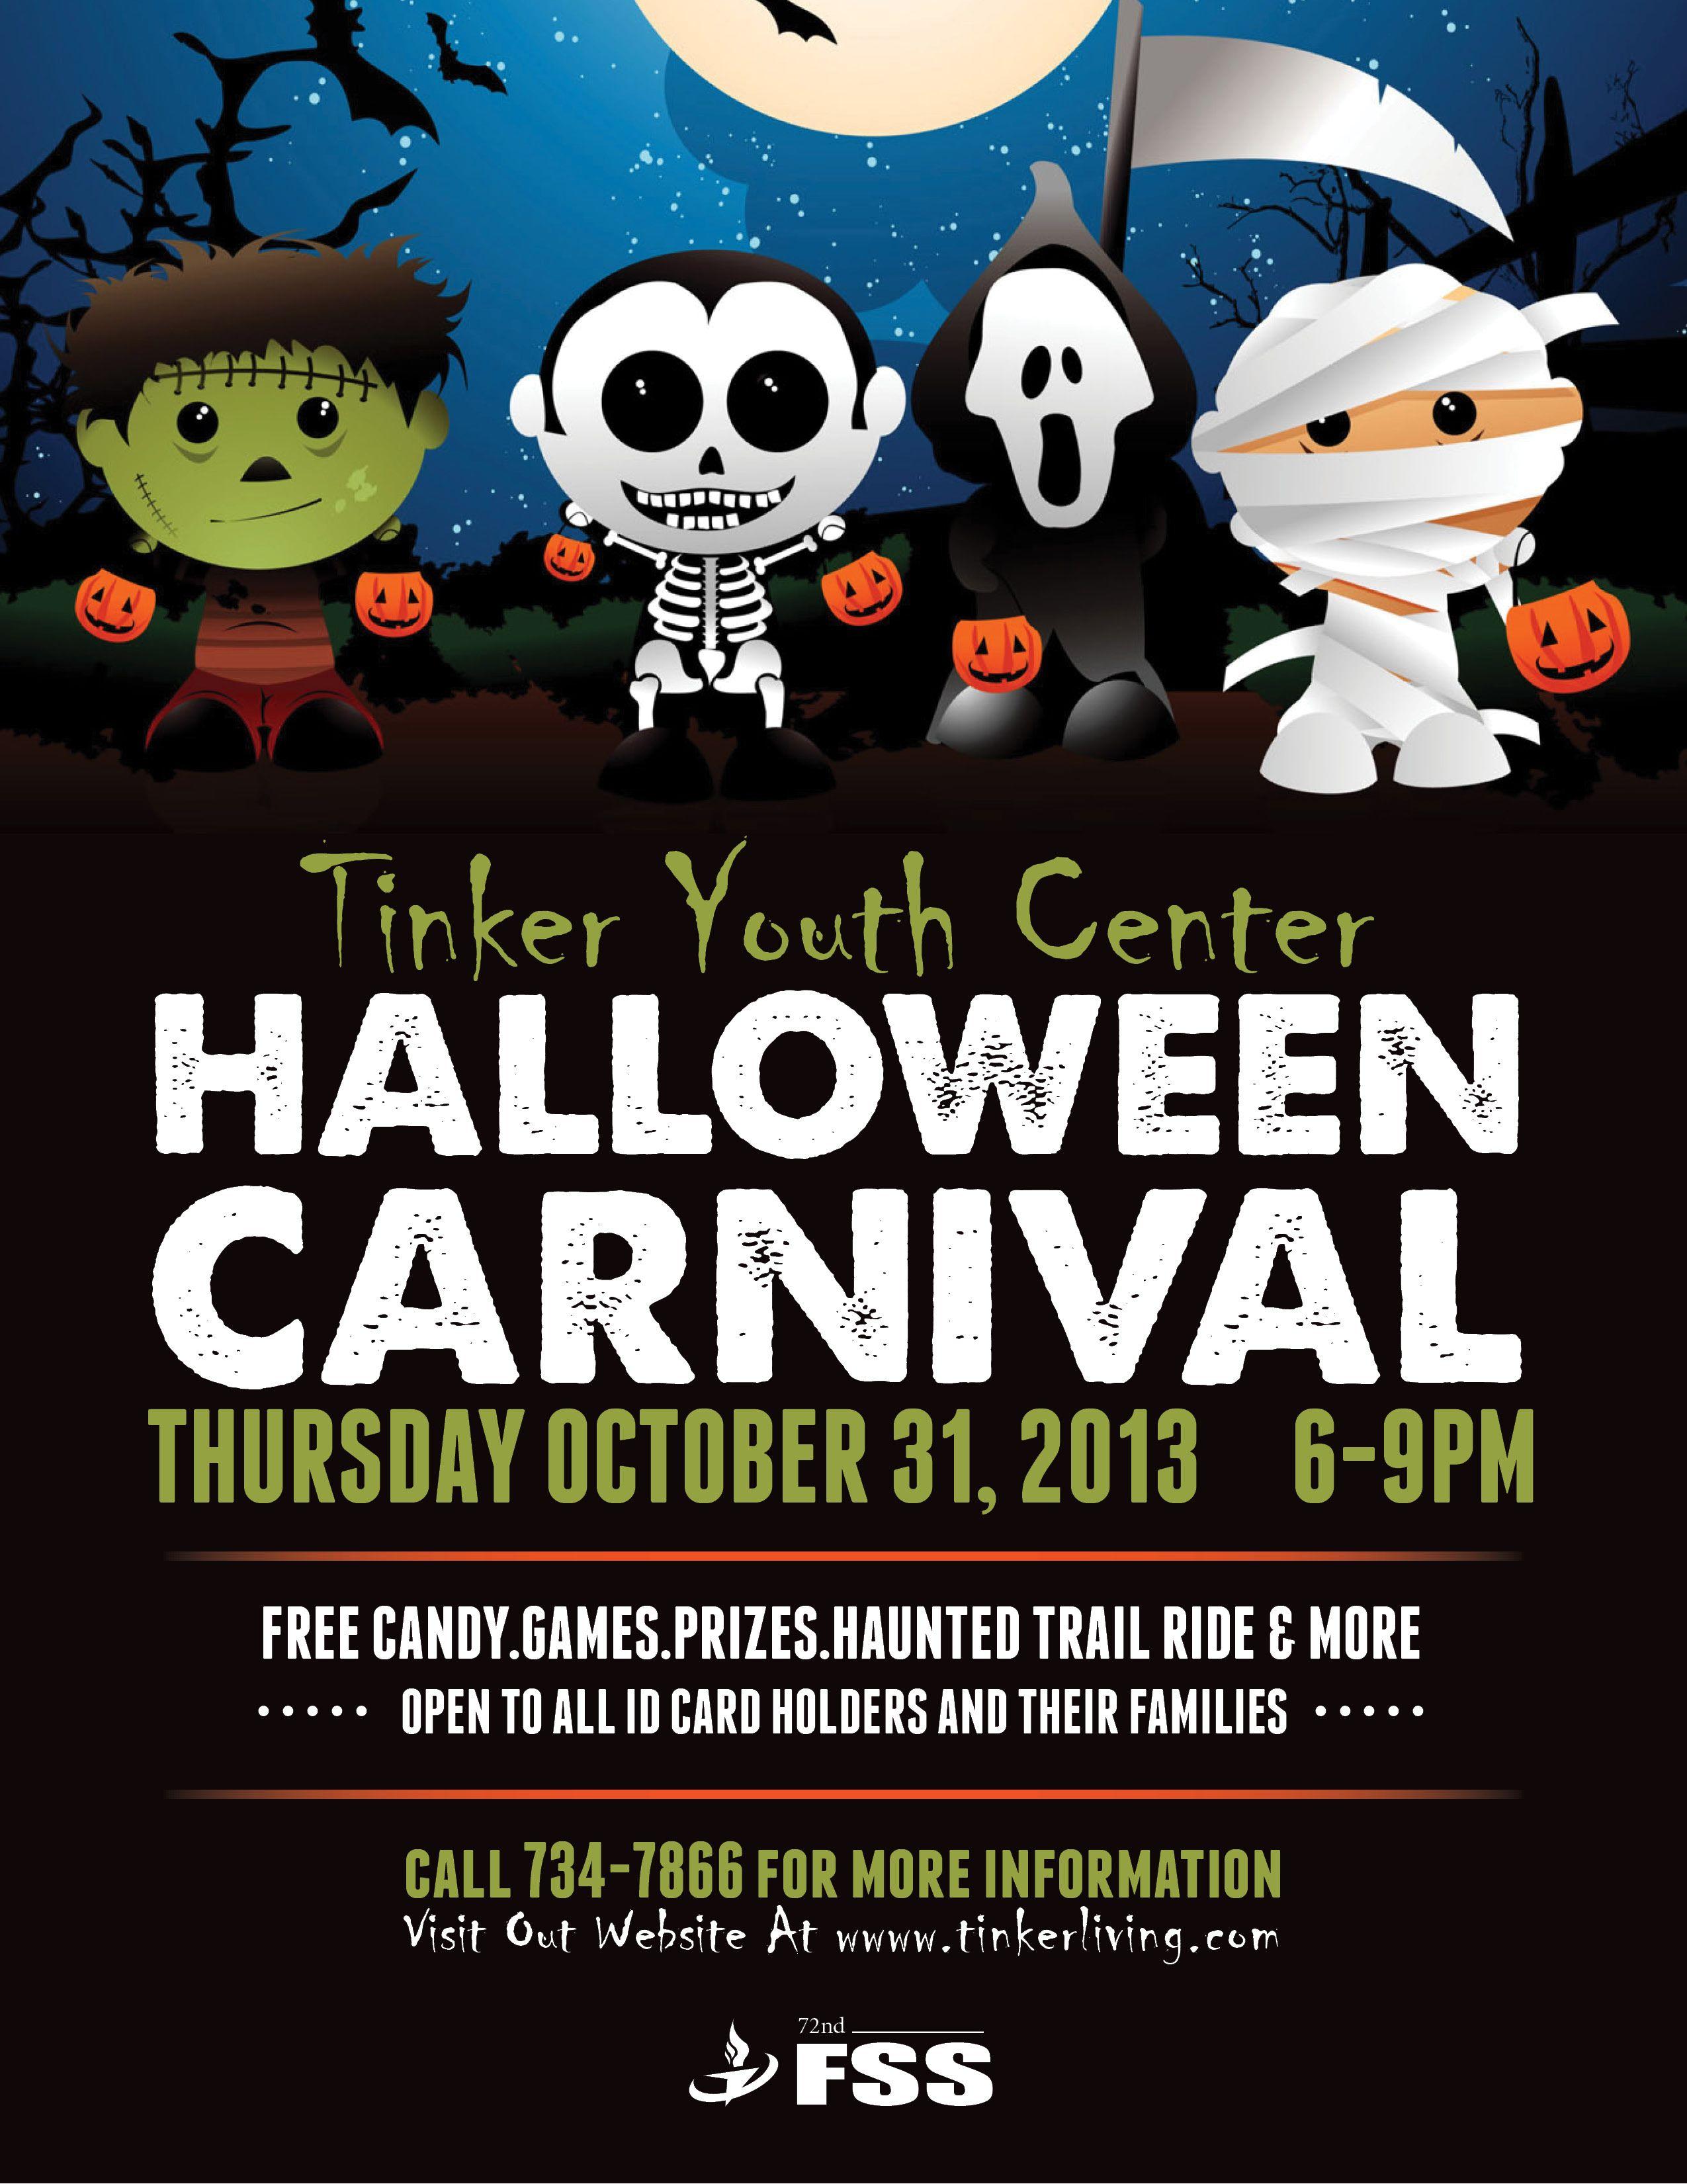 Halloween Costume Contest Flyer Yc Halloween Carnival